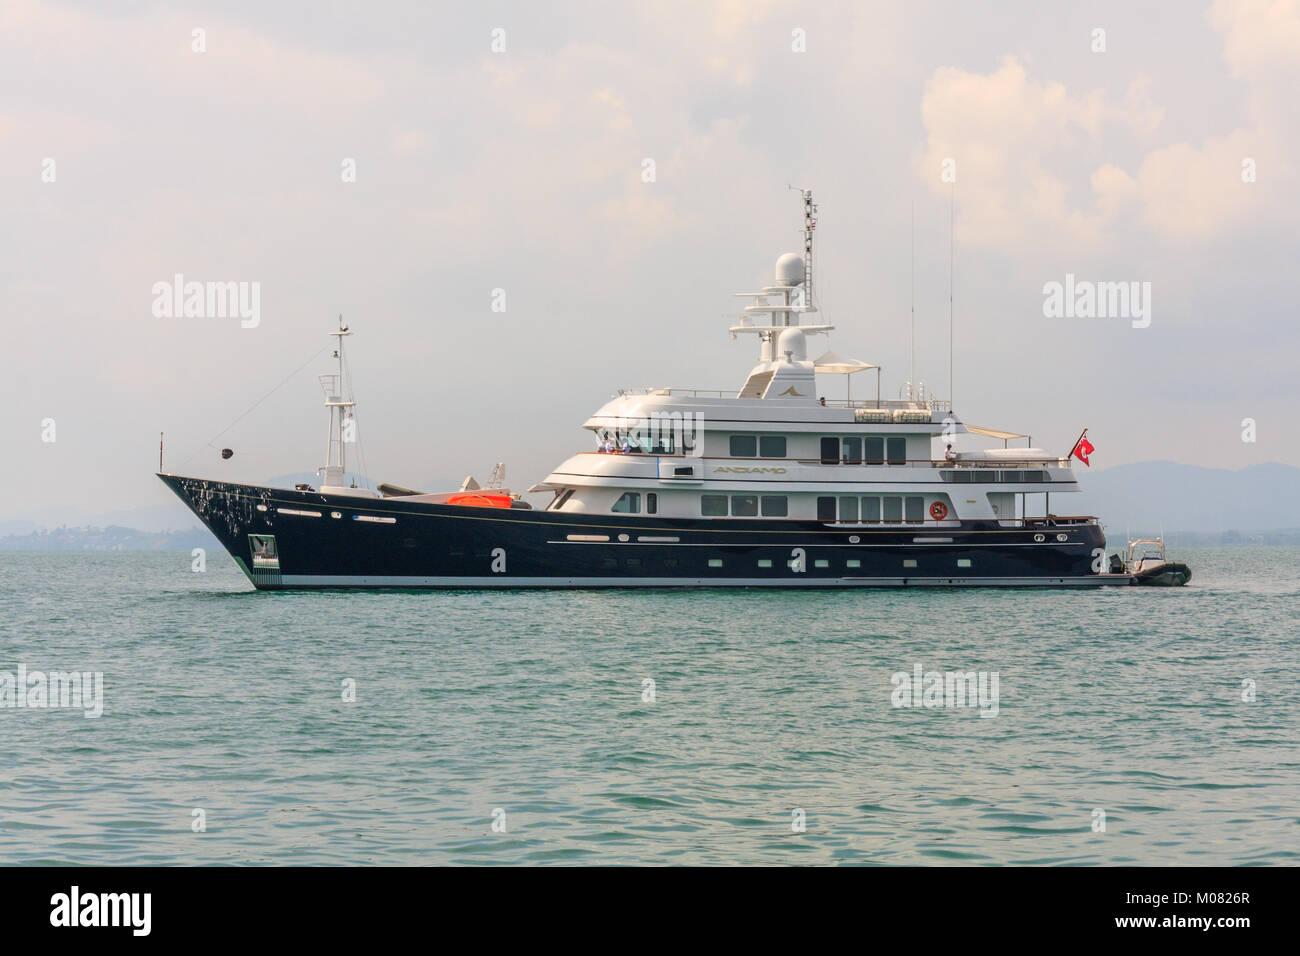 Andiamo luxury charter yacht built by Benetti Stock Photo